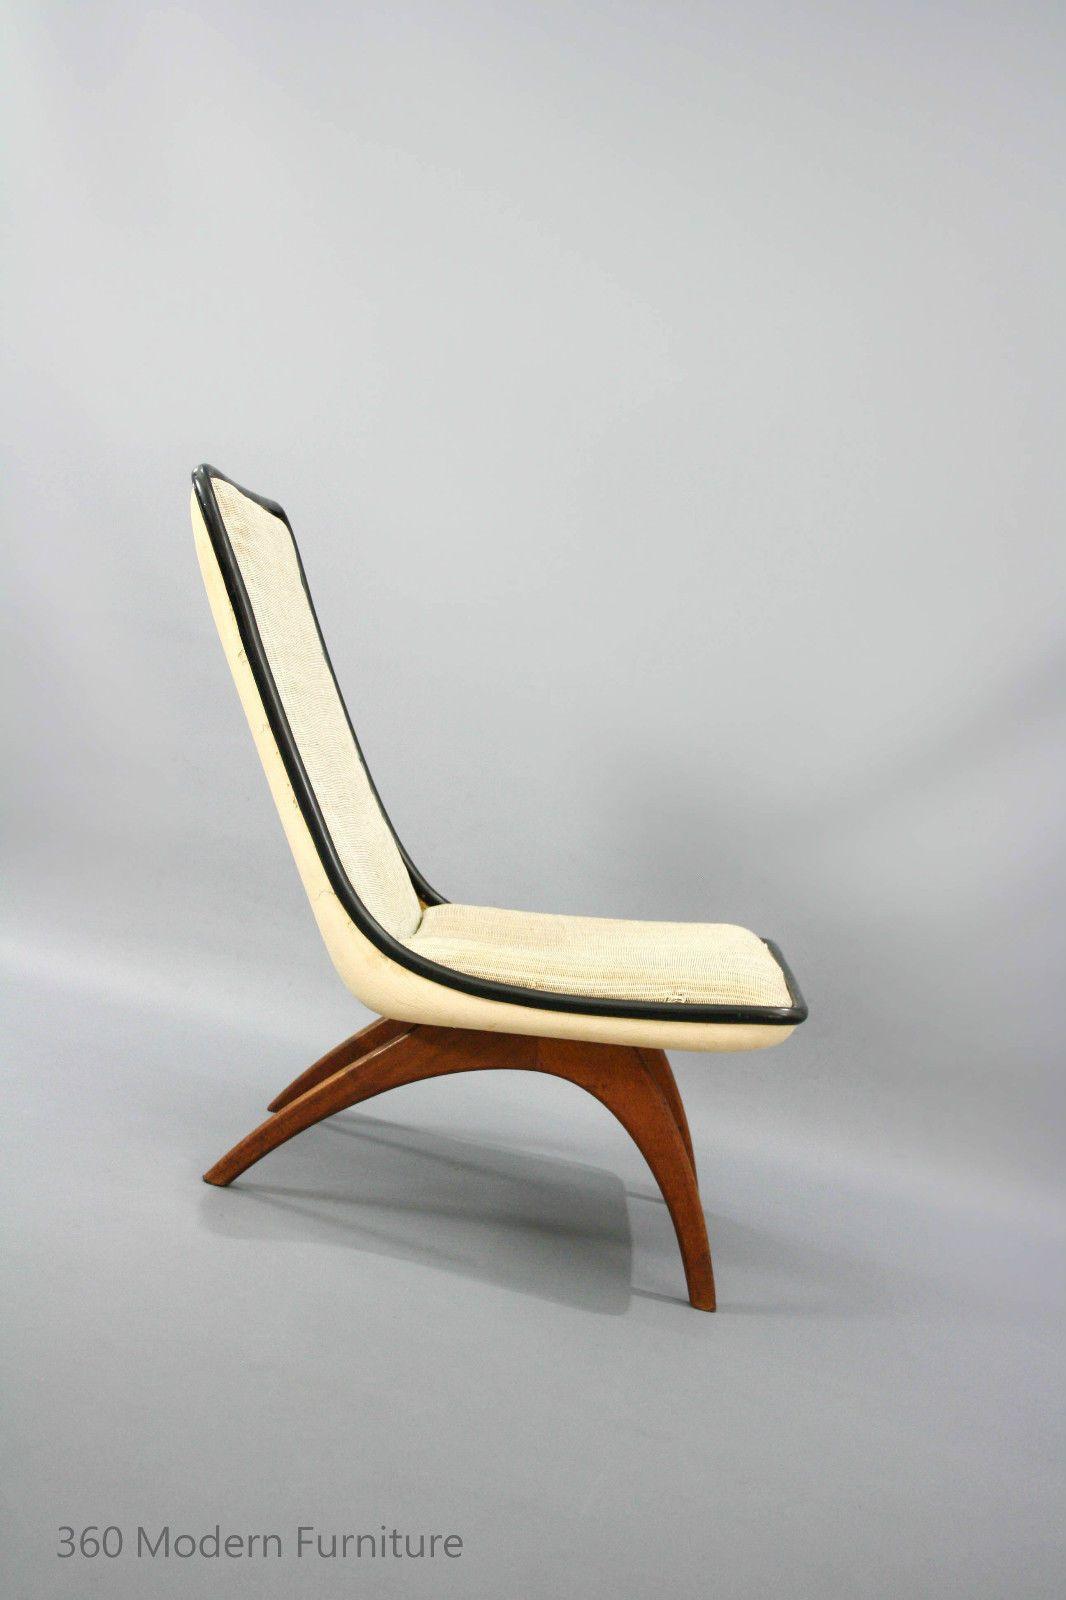 Mid century modern arm chair retro vintage teak fibreglass danish lurashell era armchair in narre warren 360 modern furniture vic ebay